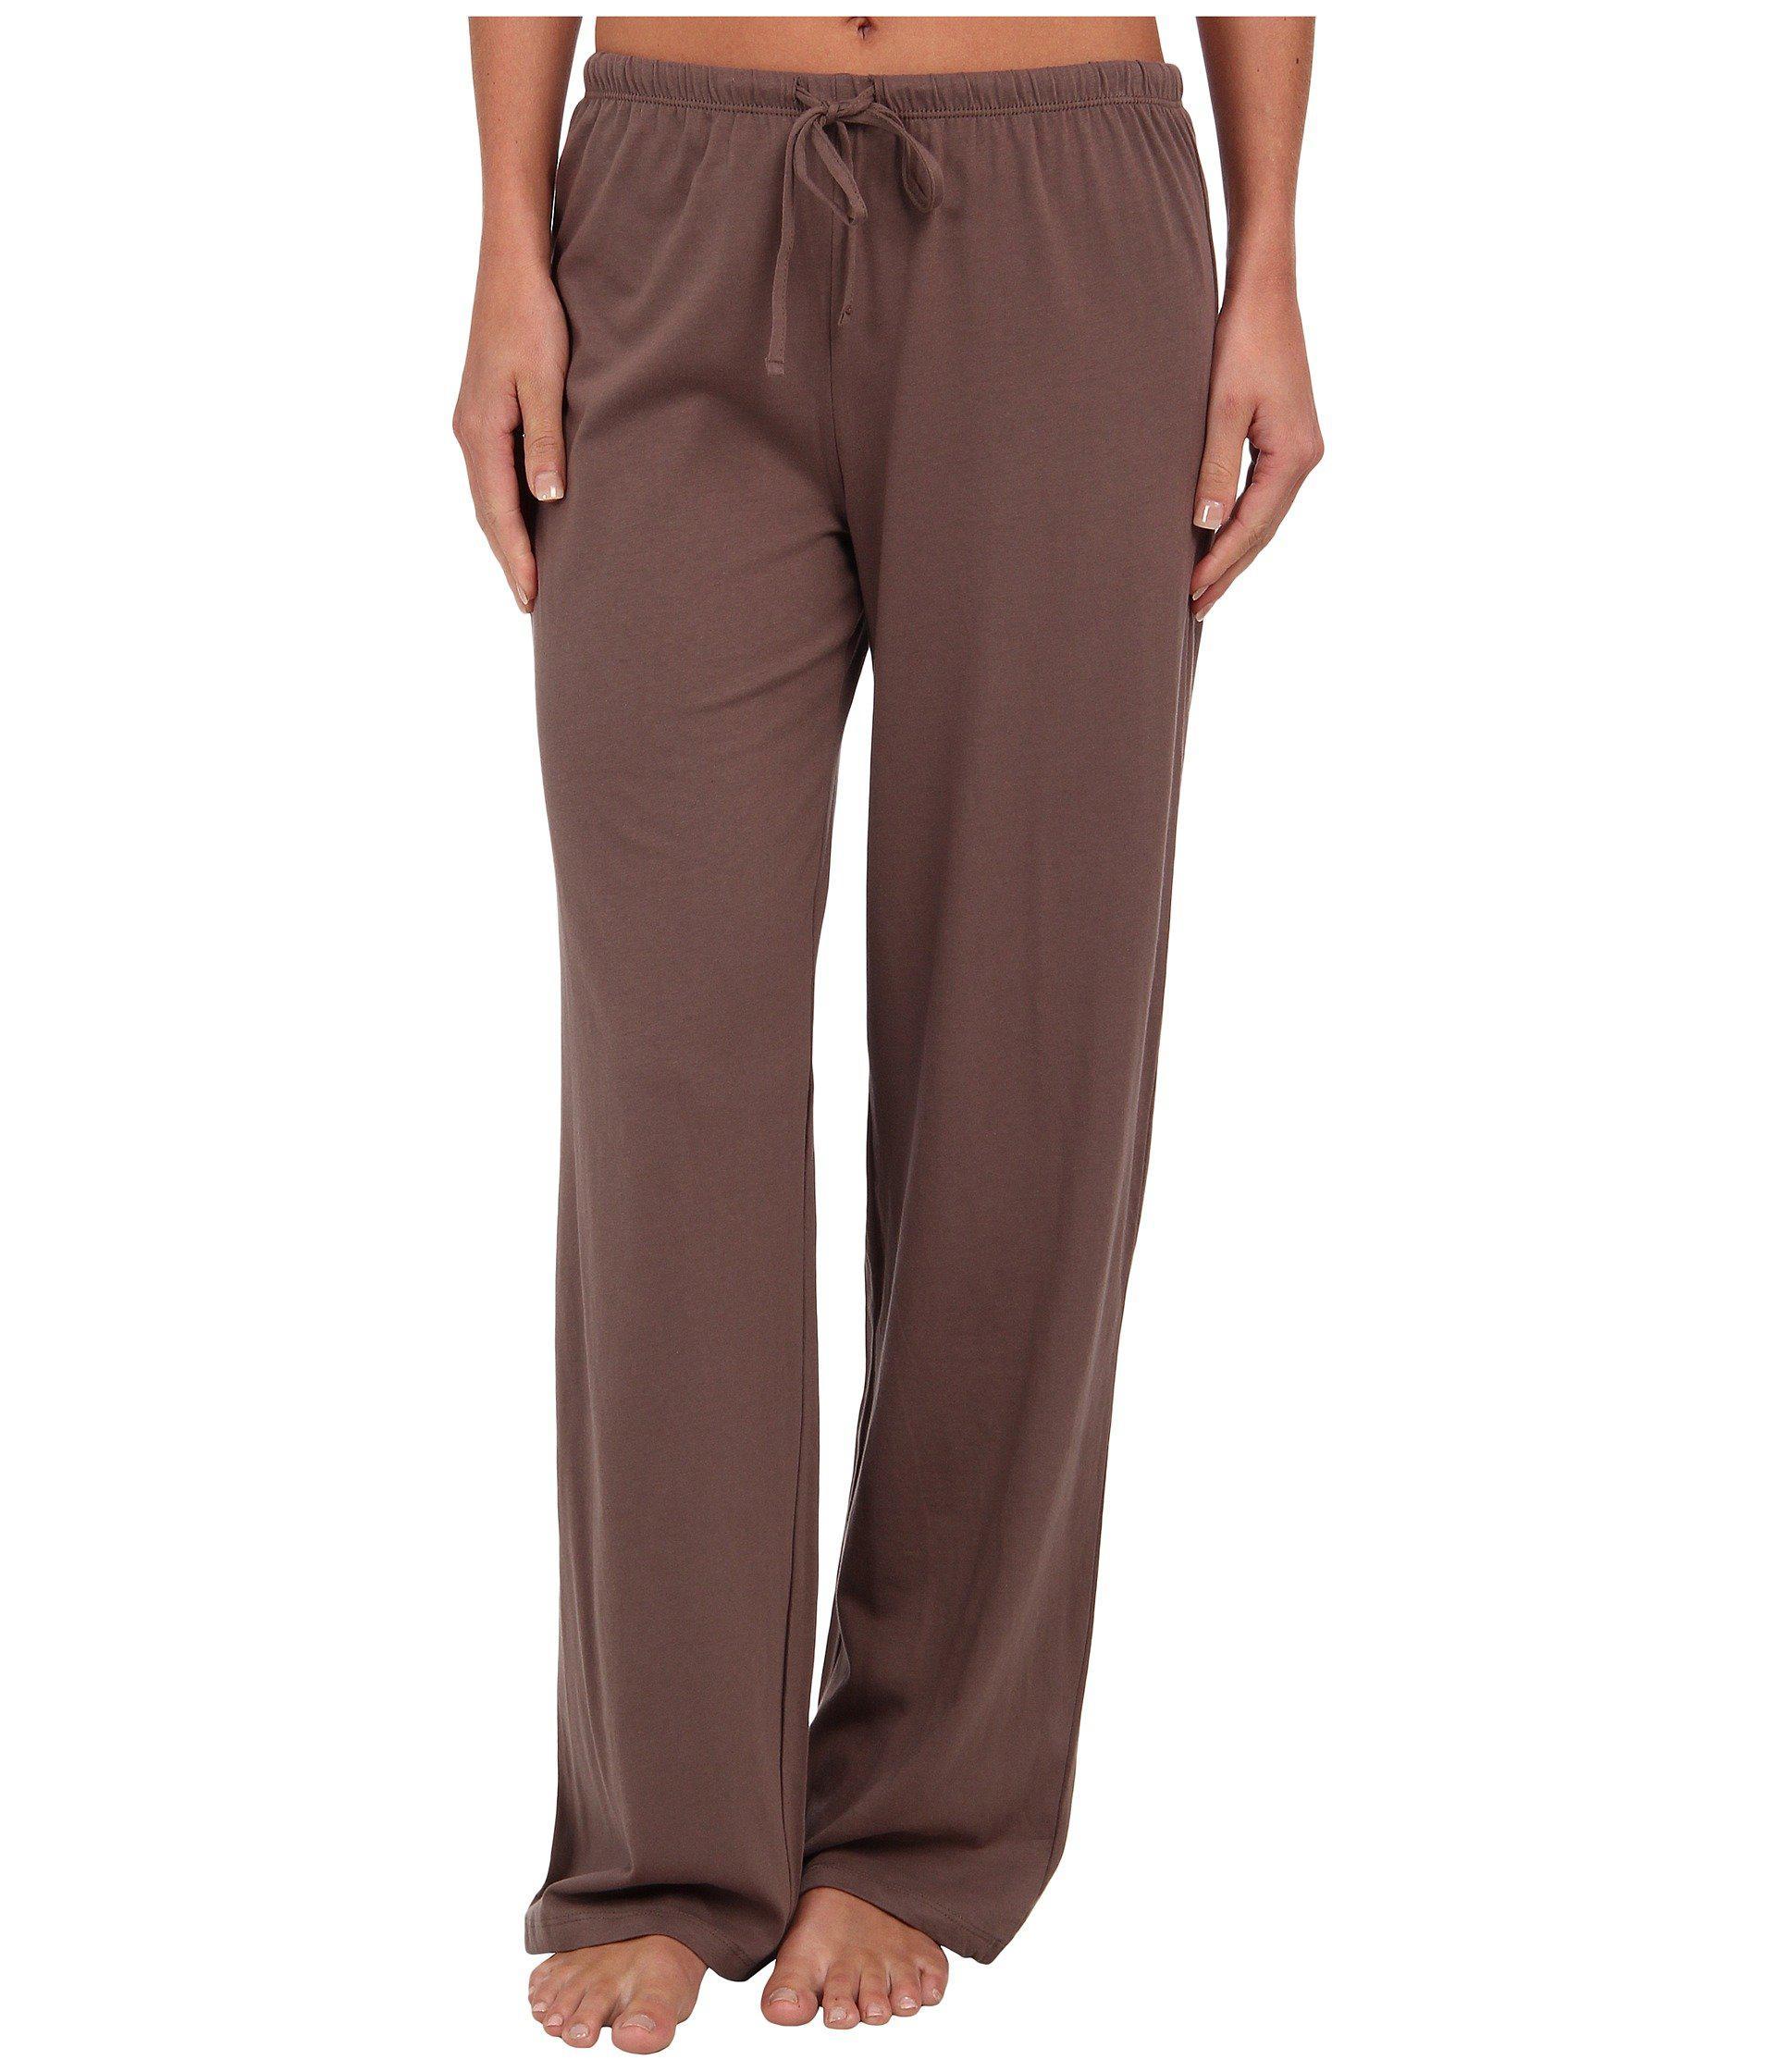 Lyst - Jockey Cotton Essentials Long Pajama Pant (taupe) Women s ... 4bb181b07